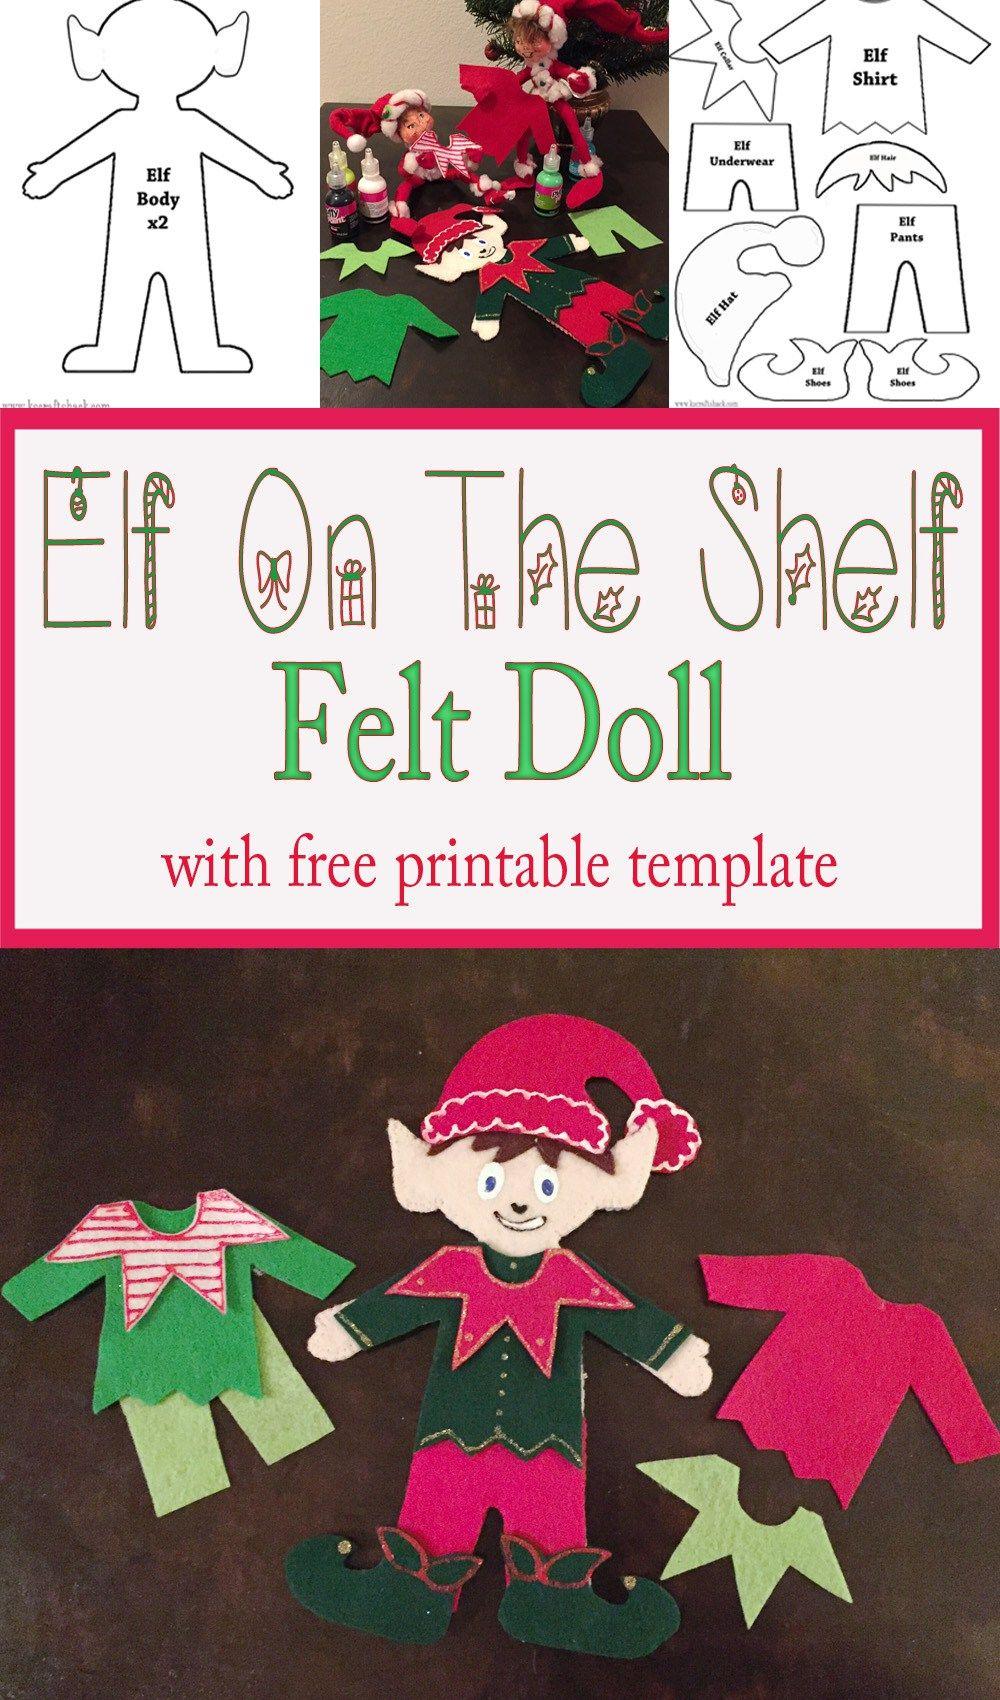 graphic about Free Printable Elf Pattern named Felt Elf upon the Shelf Doll Xmas Felt xmas